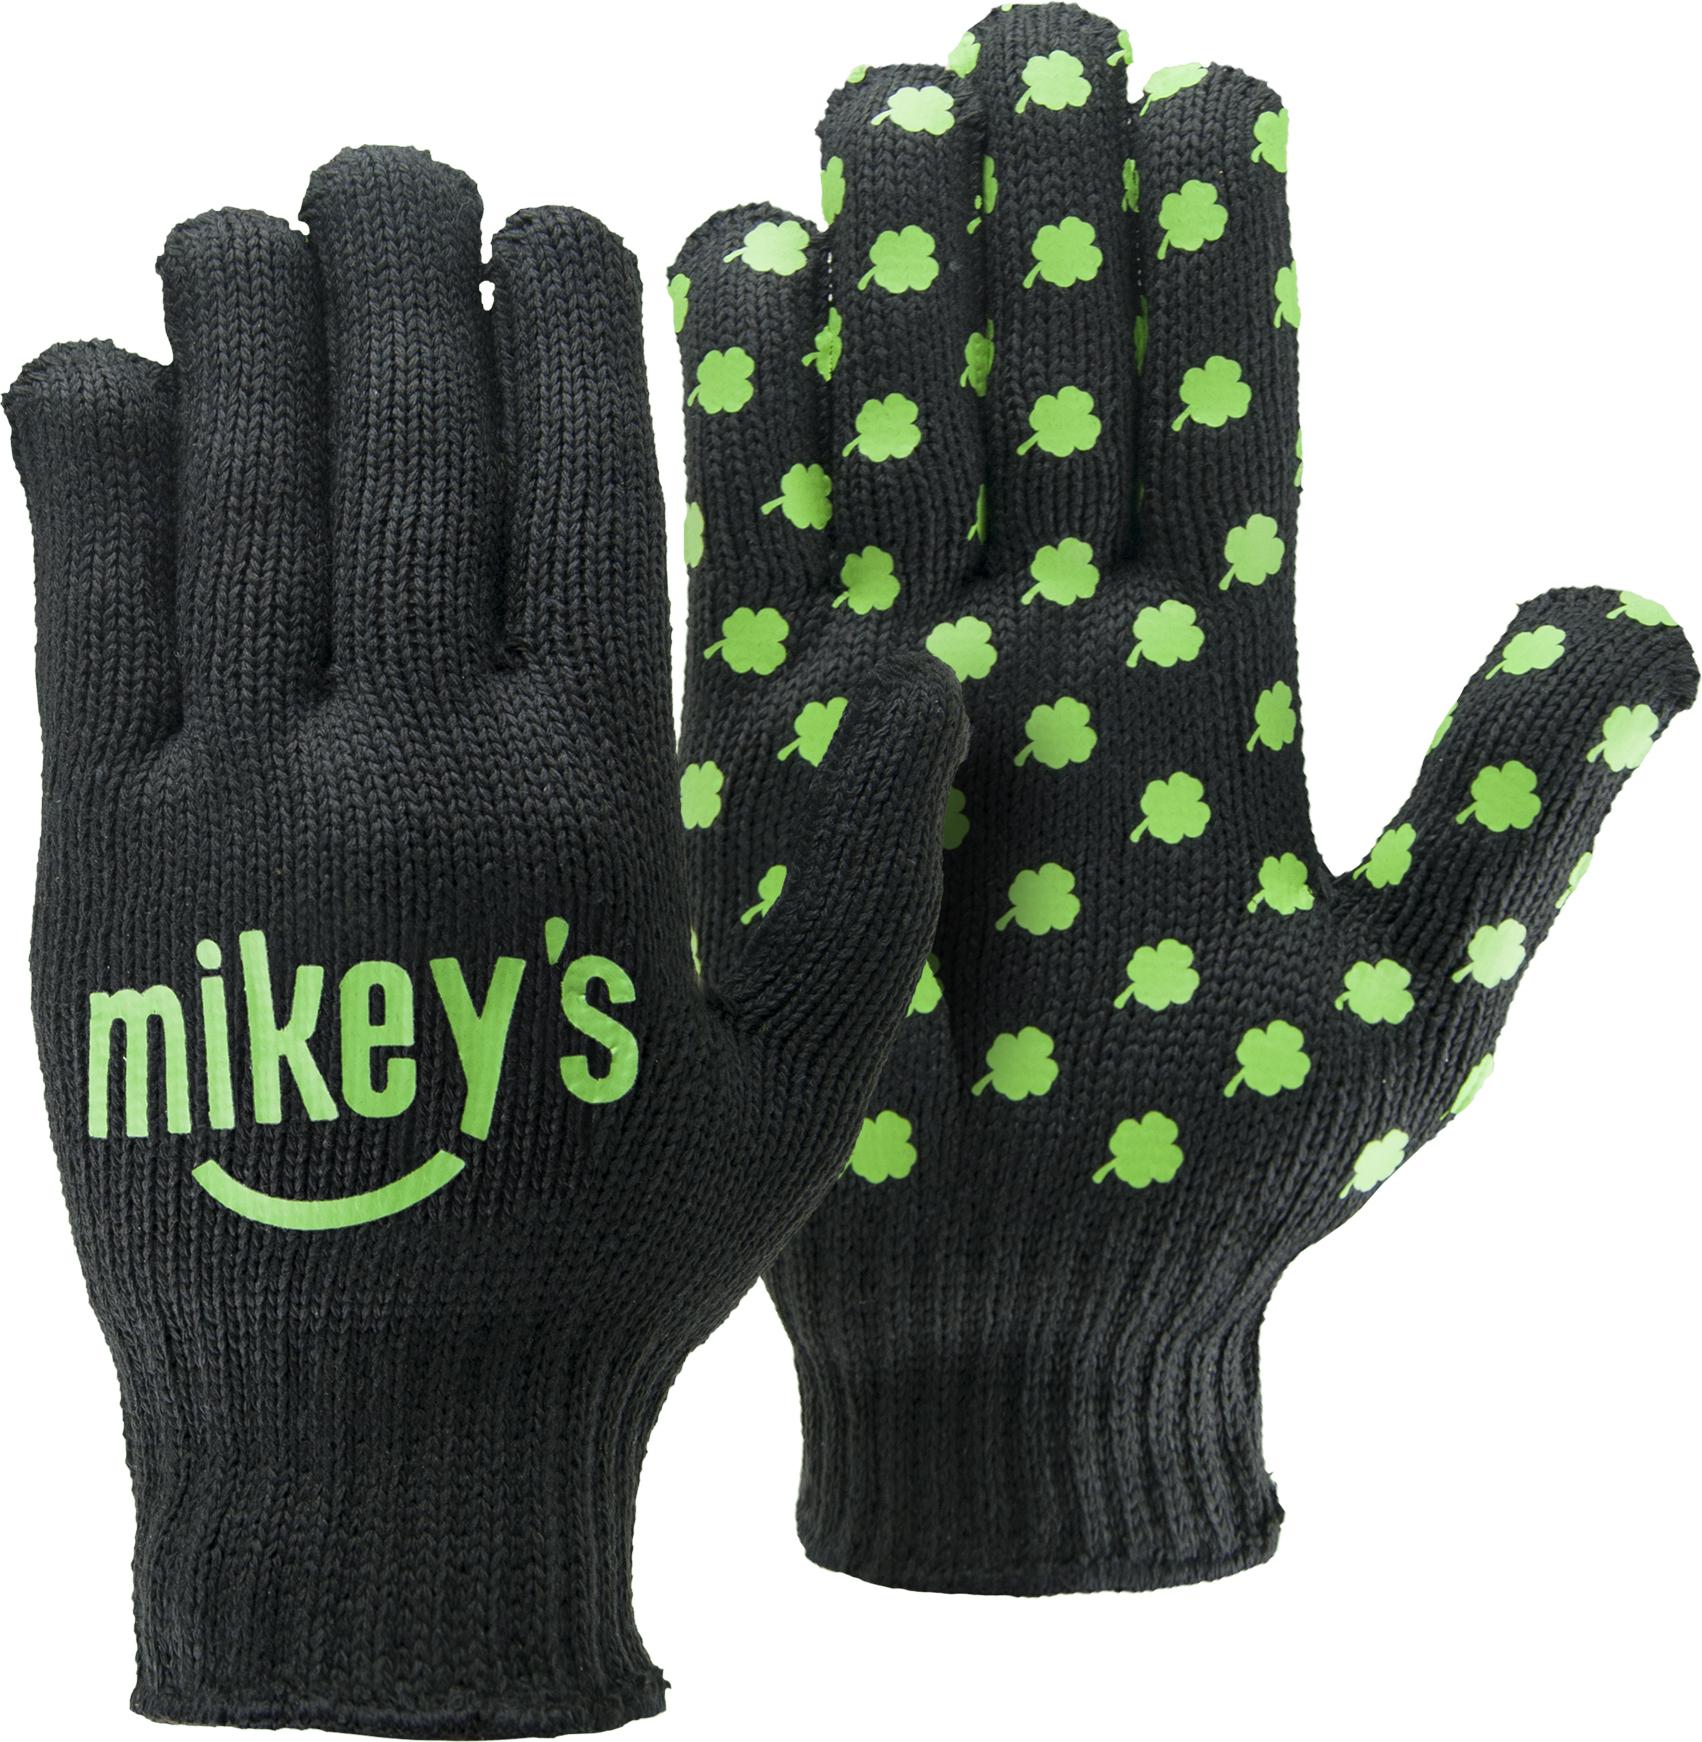 Black Knit Gloves w/Step & Repeat Imprint